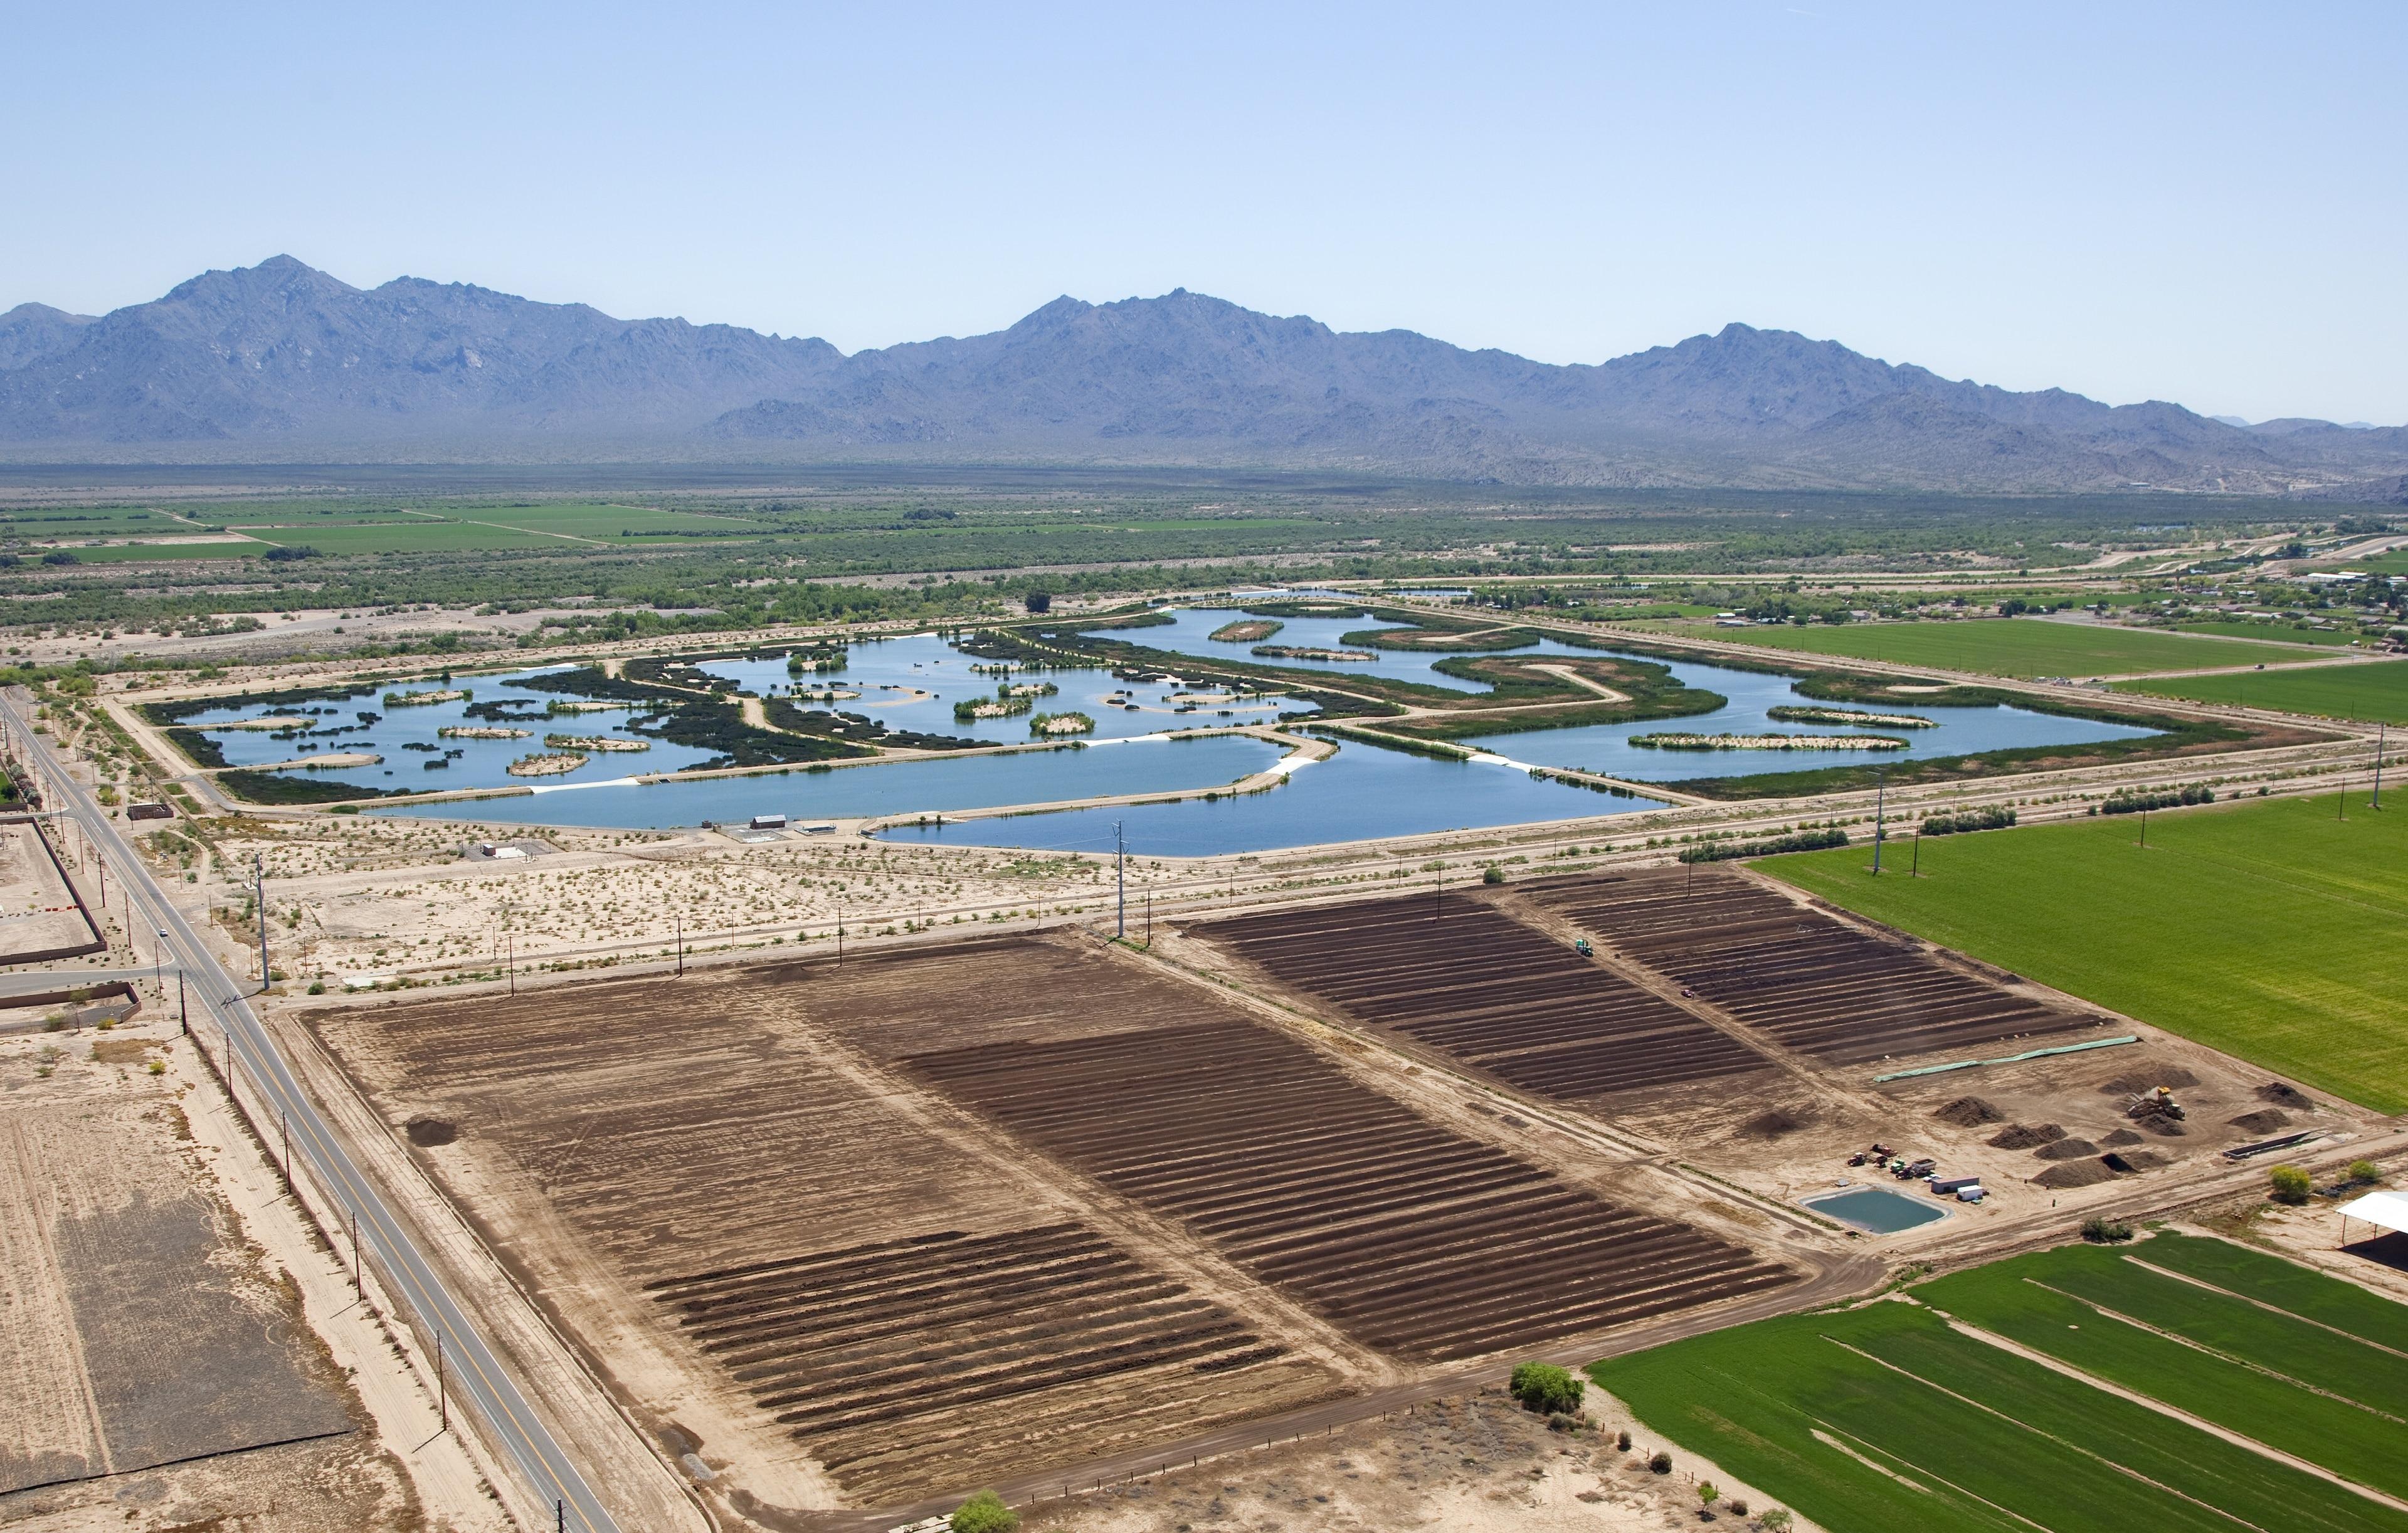 Gila River Arena, Glendale, Arizona, United States of America